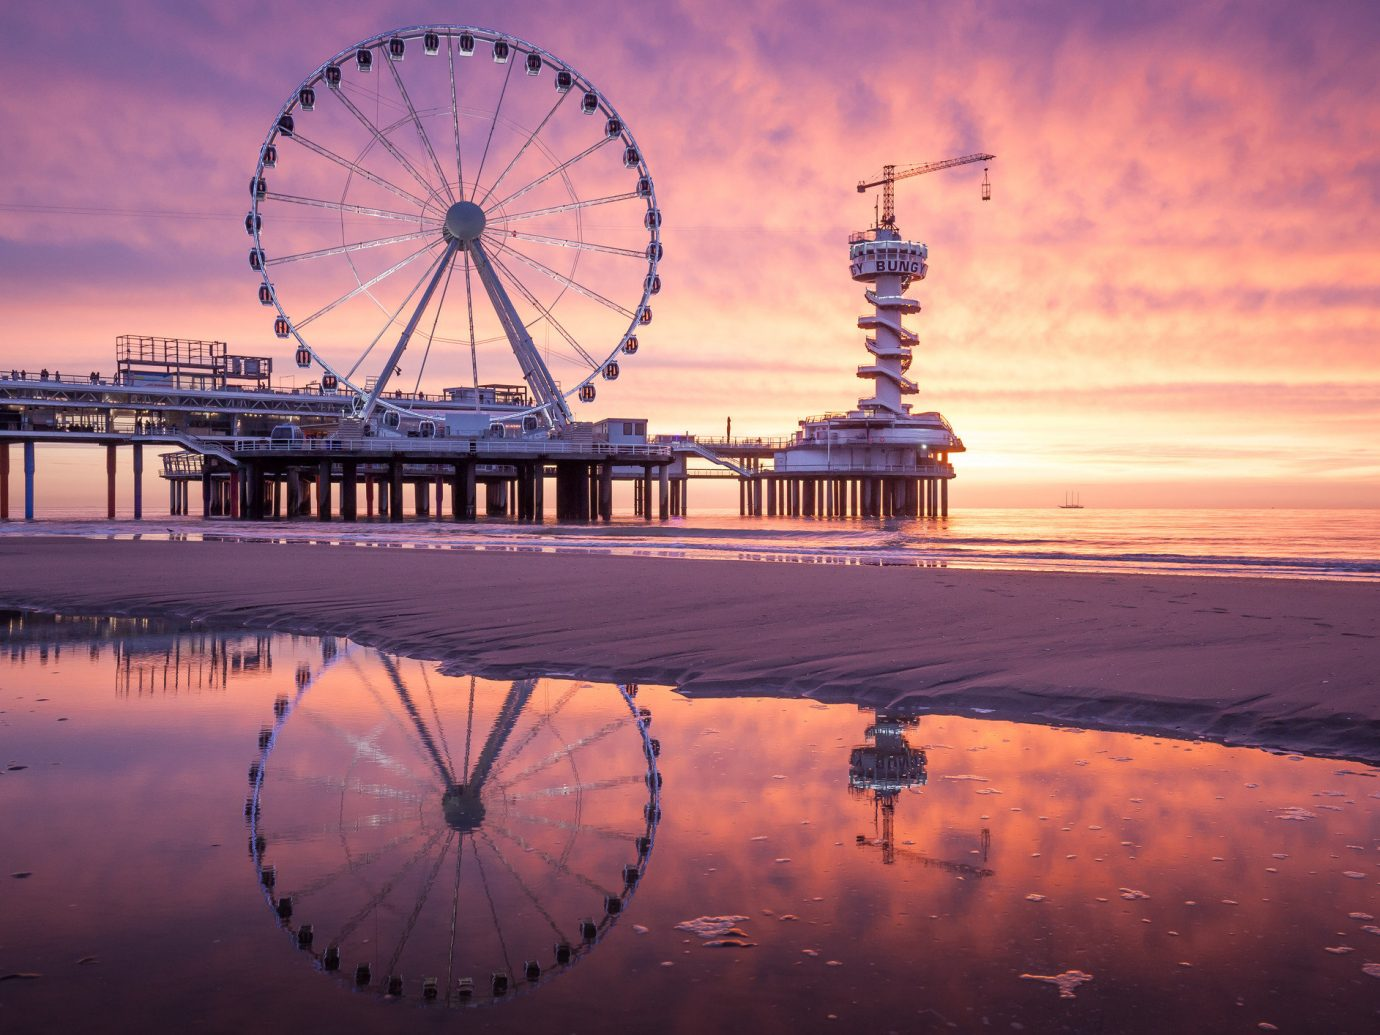 Trip Ideas sky outdoor reflection landmark tourist attraction water sunrise Sea Sunset dawn horizon dusk cloud evening ferris wheel calm fixed link